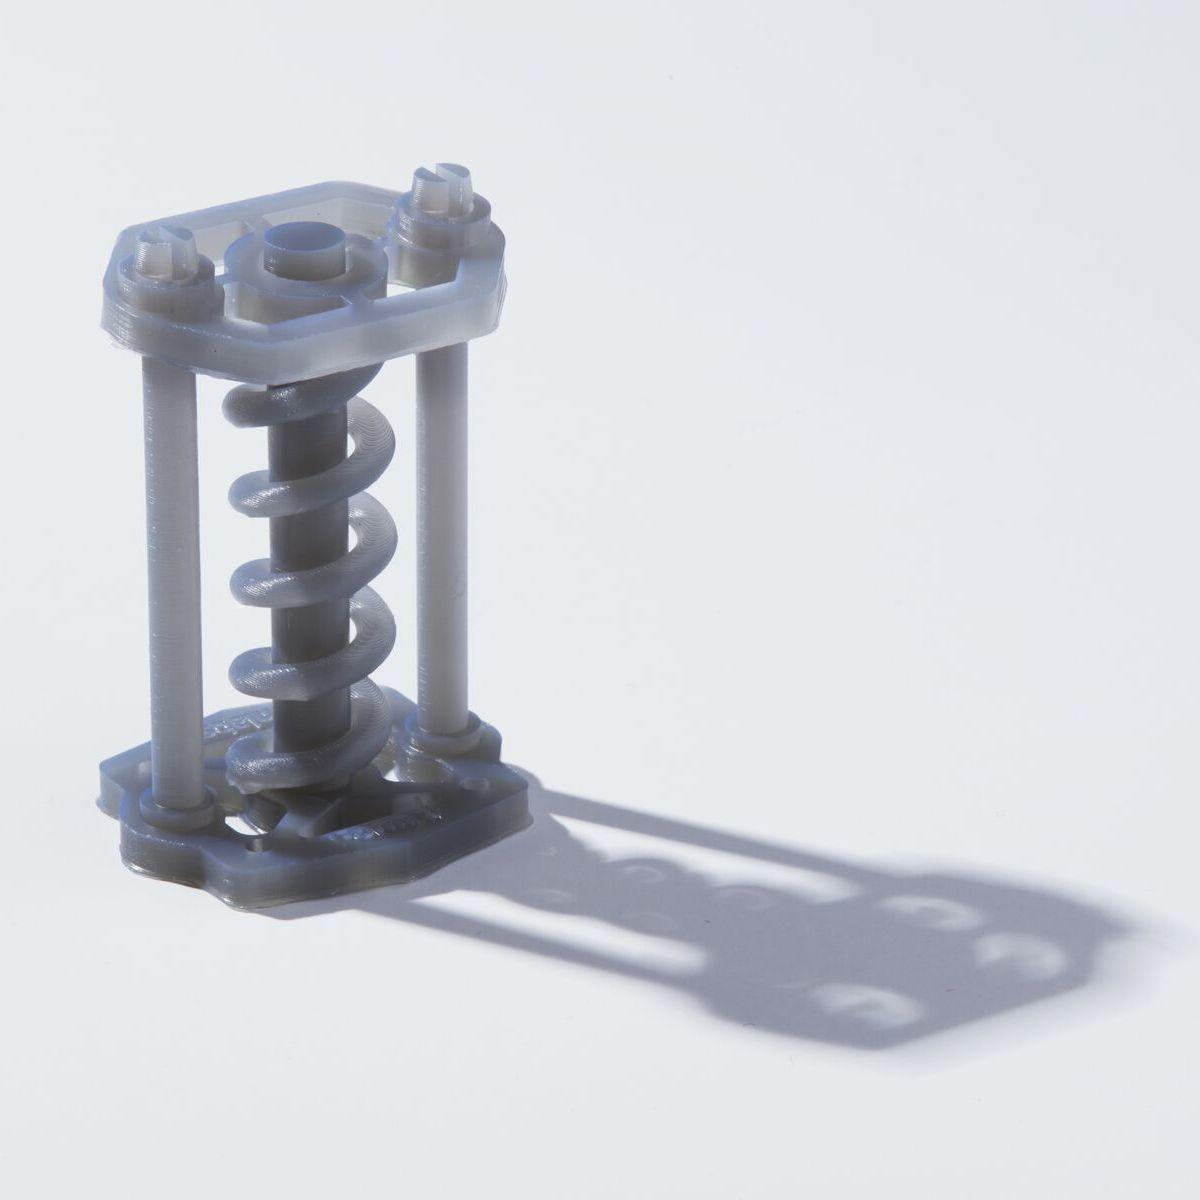 Образец детали из Tough 1500 Resin - пружина